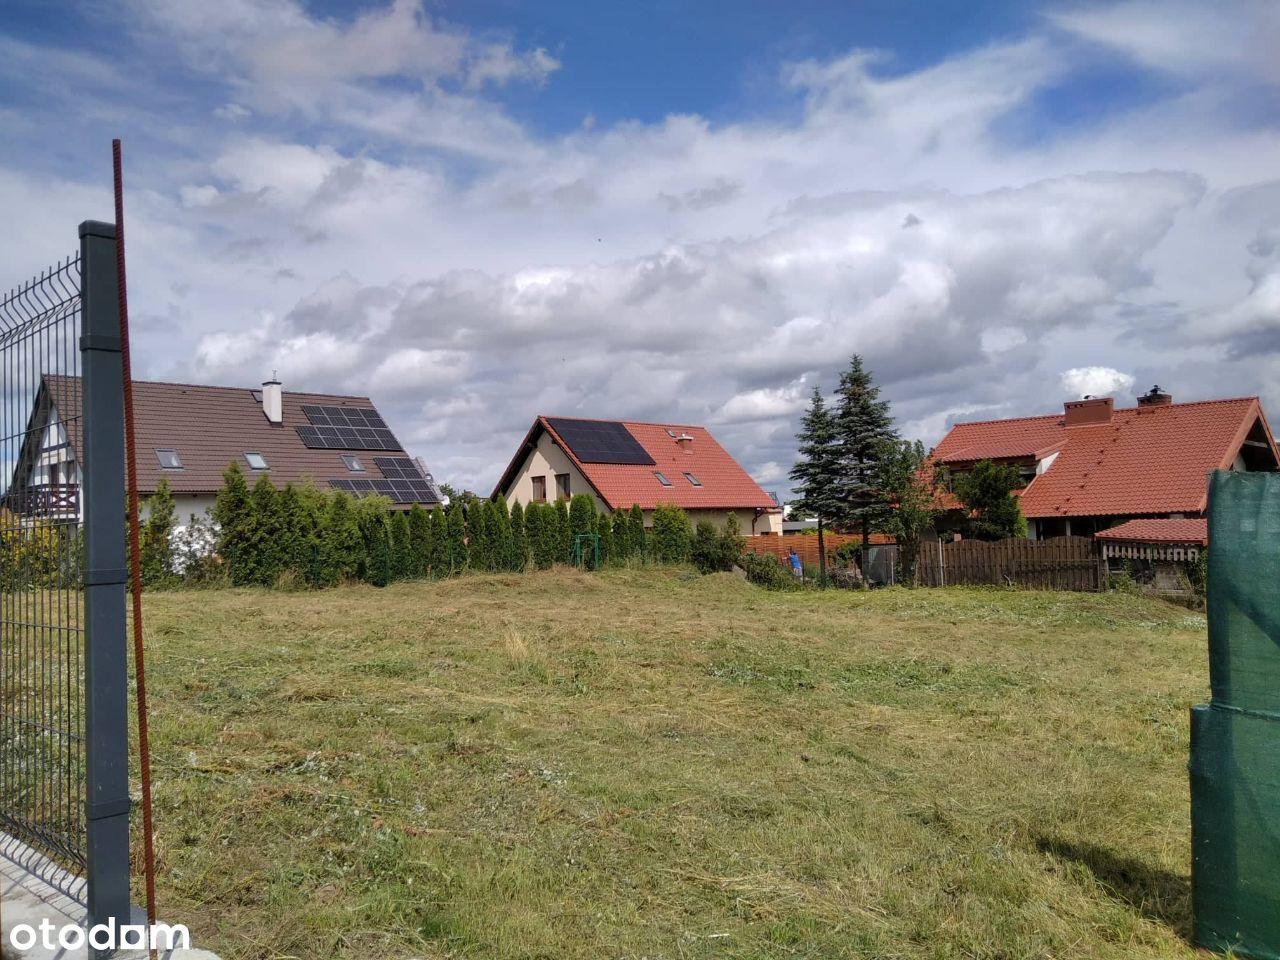 Działka budowlana blisko Centrum 969 m2 Chojnice